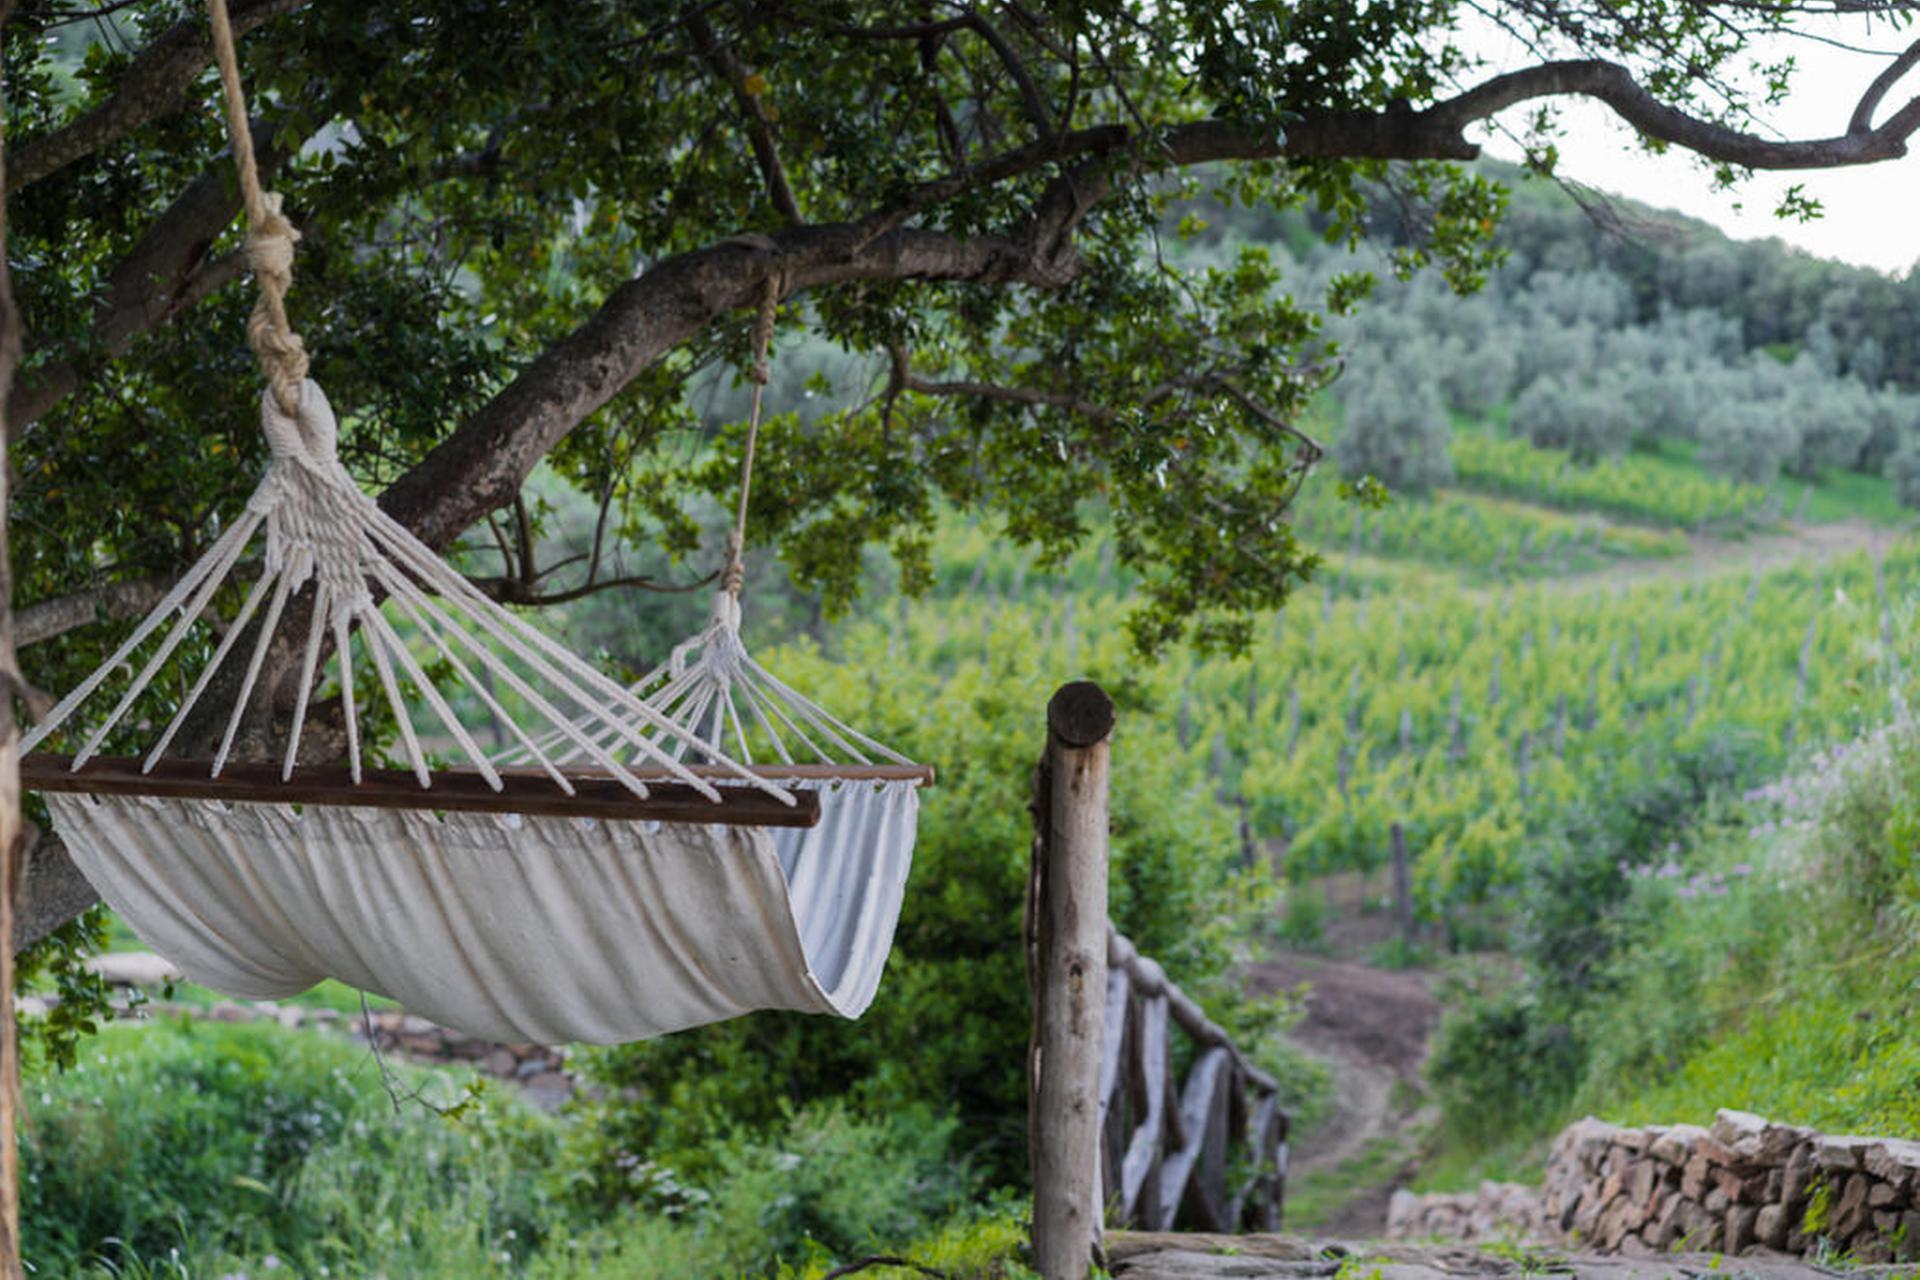 Agriturismo Toscana Agriturismo di lusso vicino al mare in Toscana